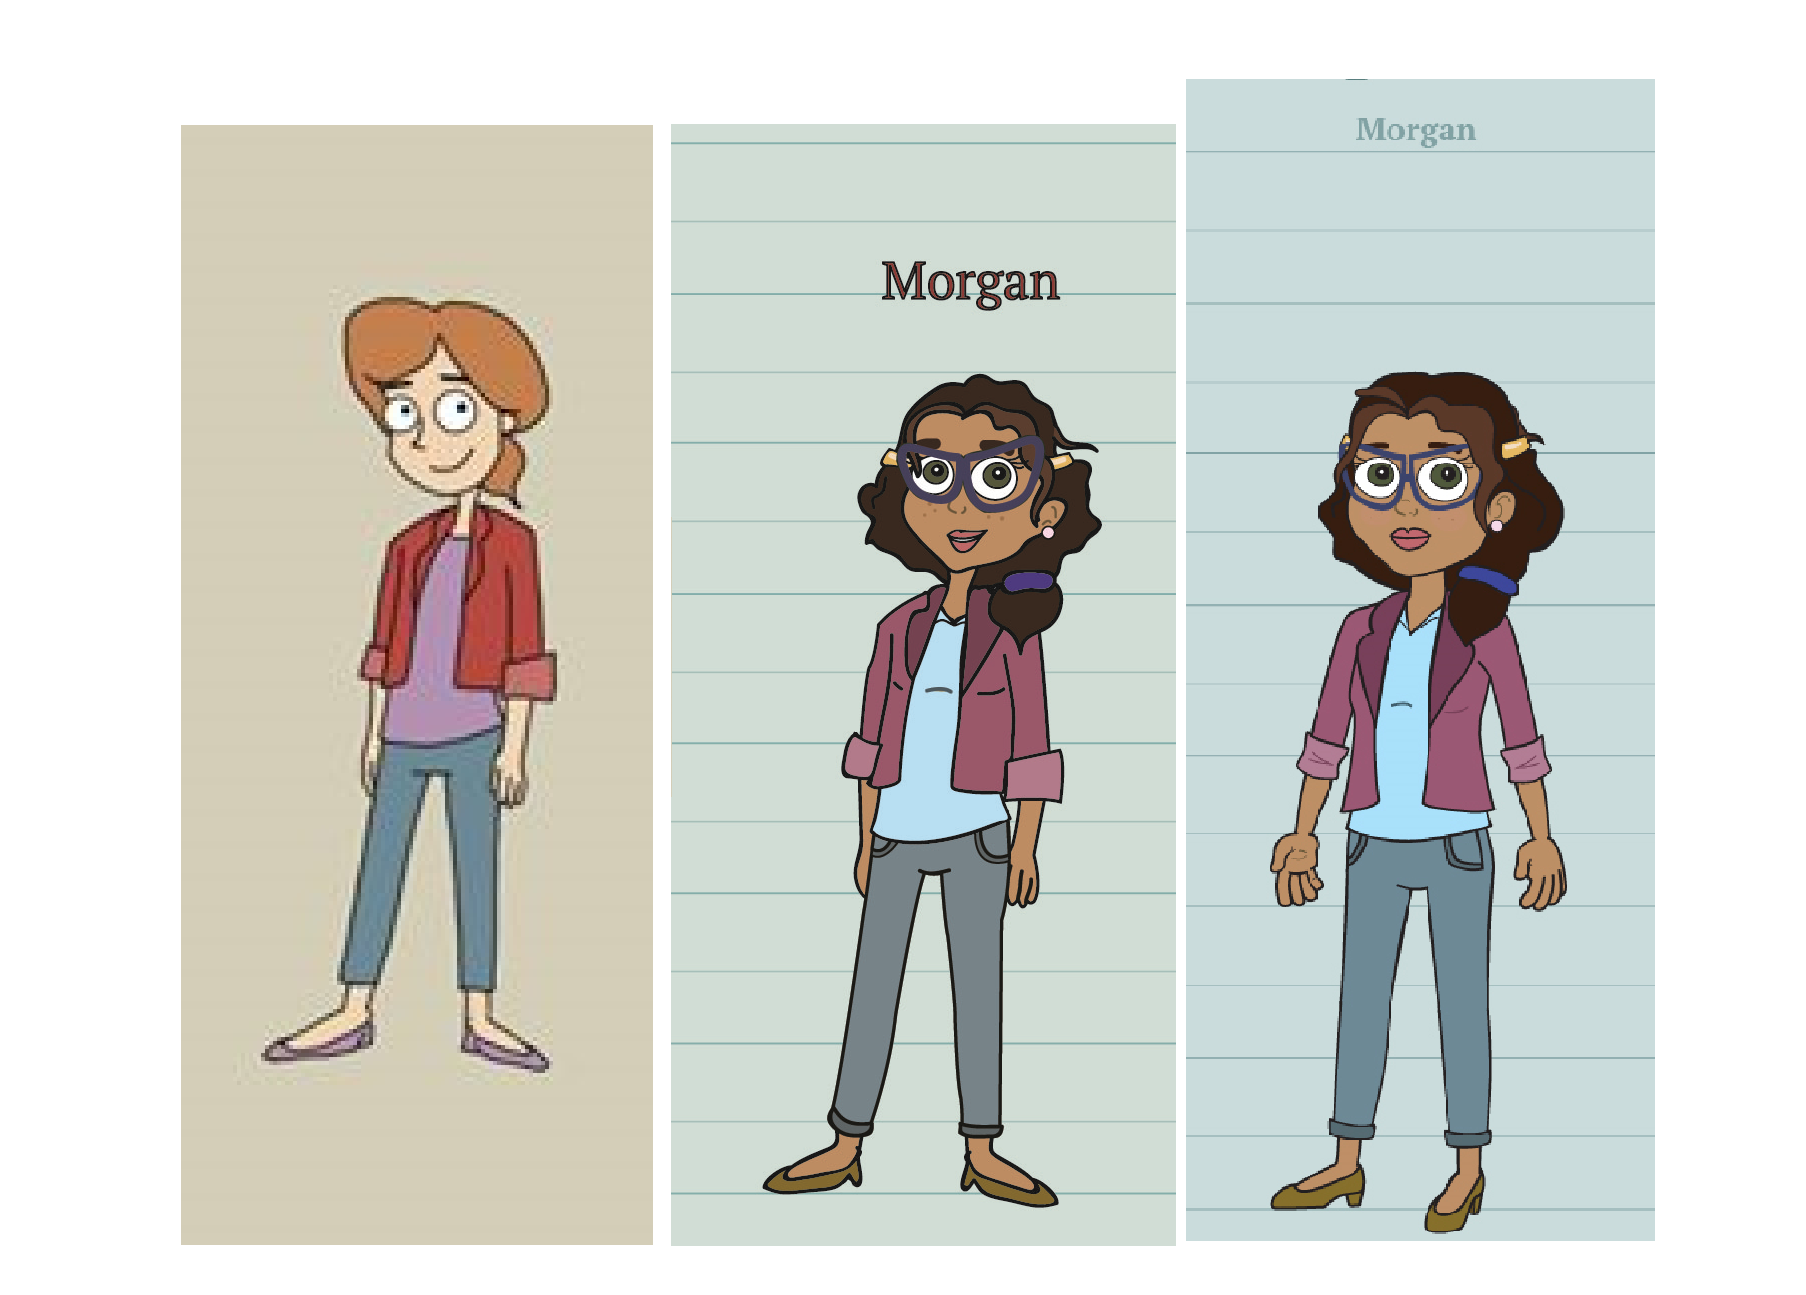 Evolution of Morgan's character design